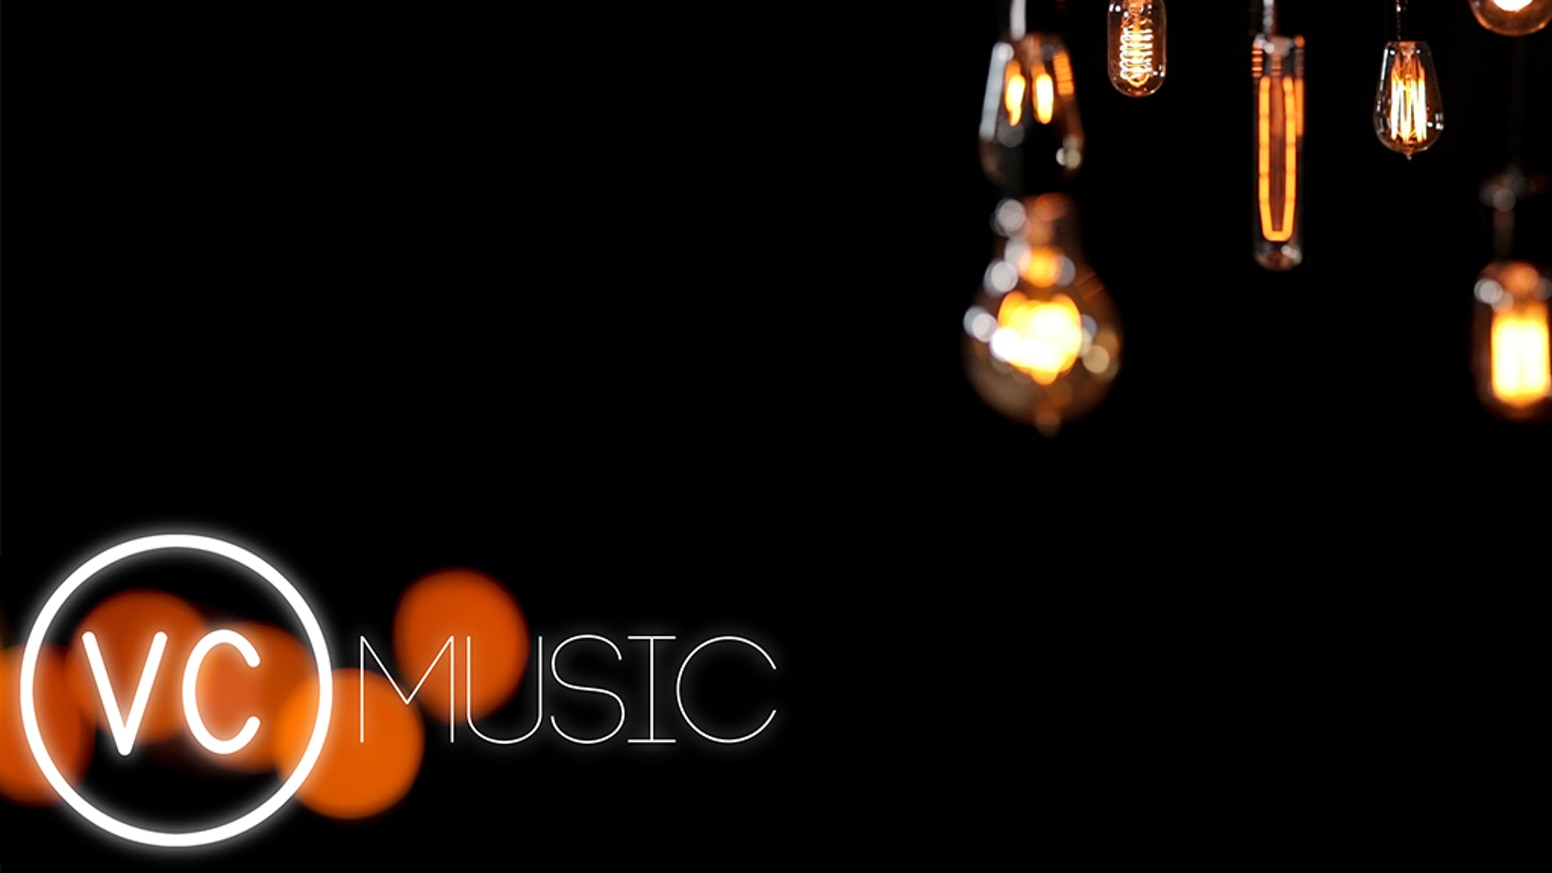 VC music, just the beginning! by Elijah Runyan, Eli Deering » Safe